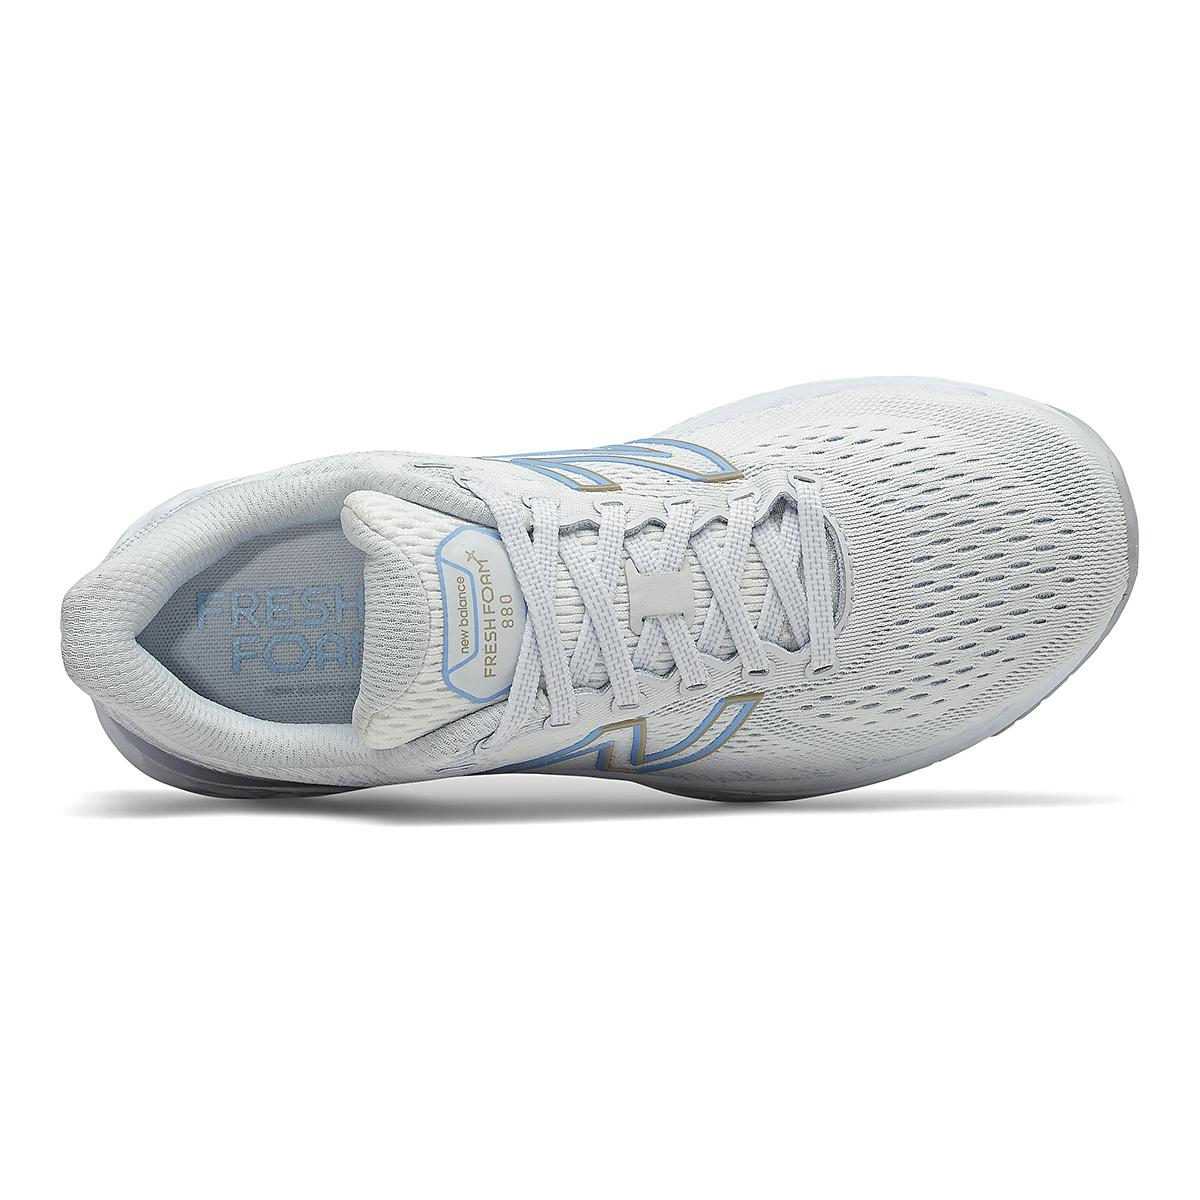 Women's New Balance 880V11 Running Shoe - Color: Arctic Fox/Uv Glo - Size: 5 - Width: Extra Wide, Arctic Fox/Uv Glo, large, image 3